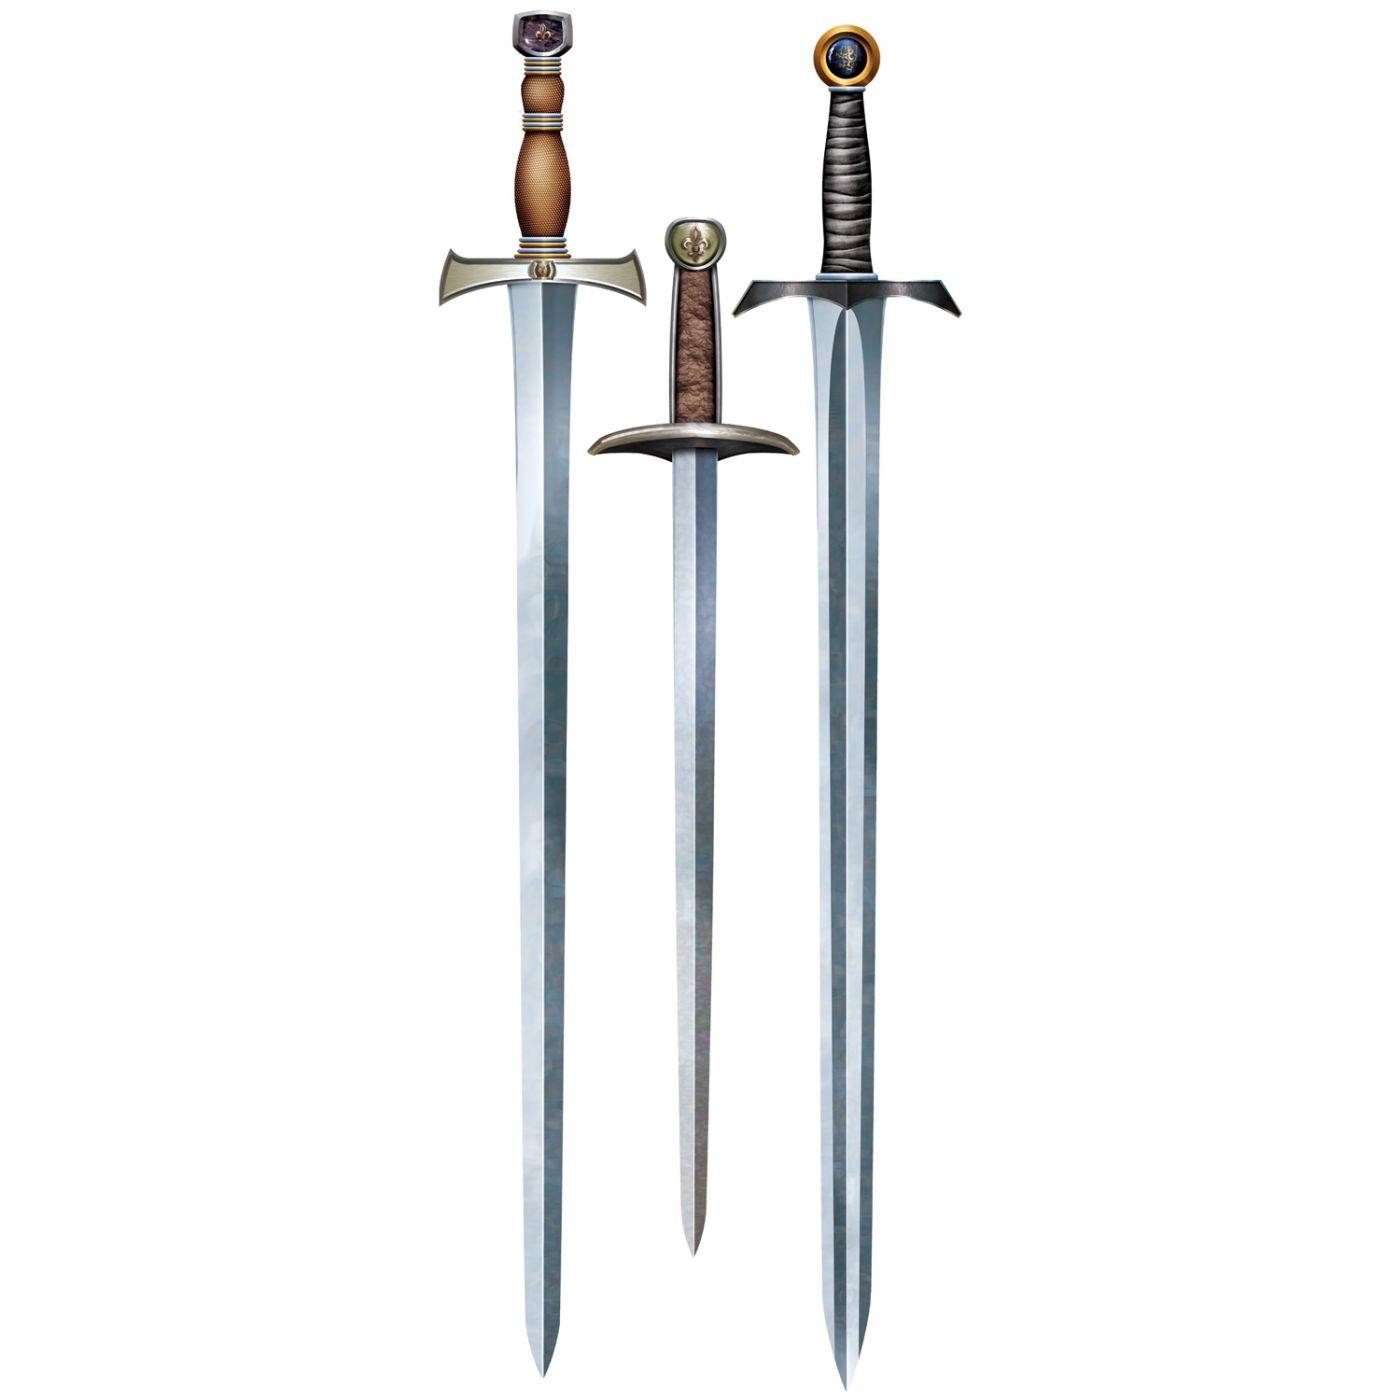 Medieval Sword Cutouts image